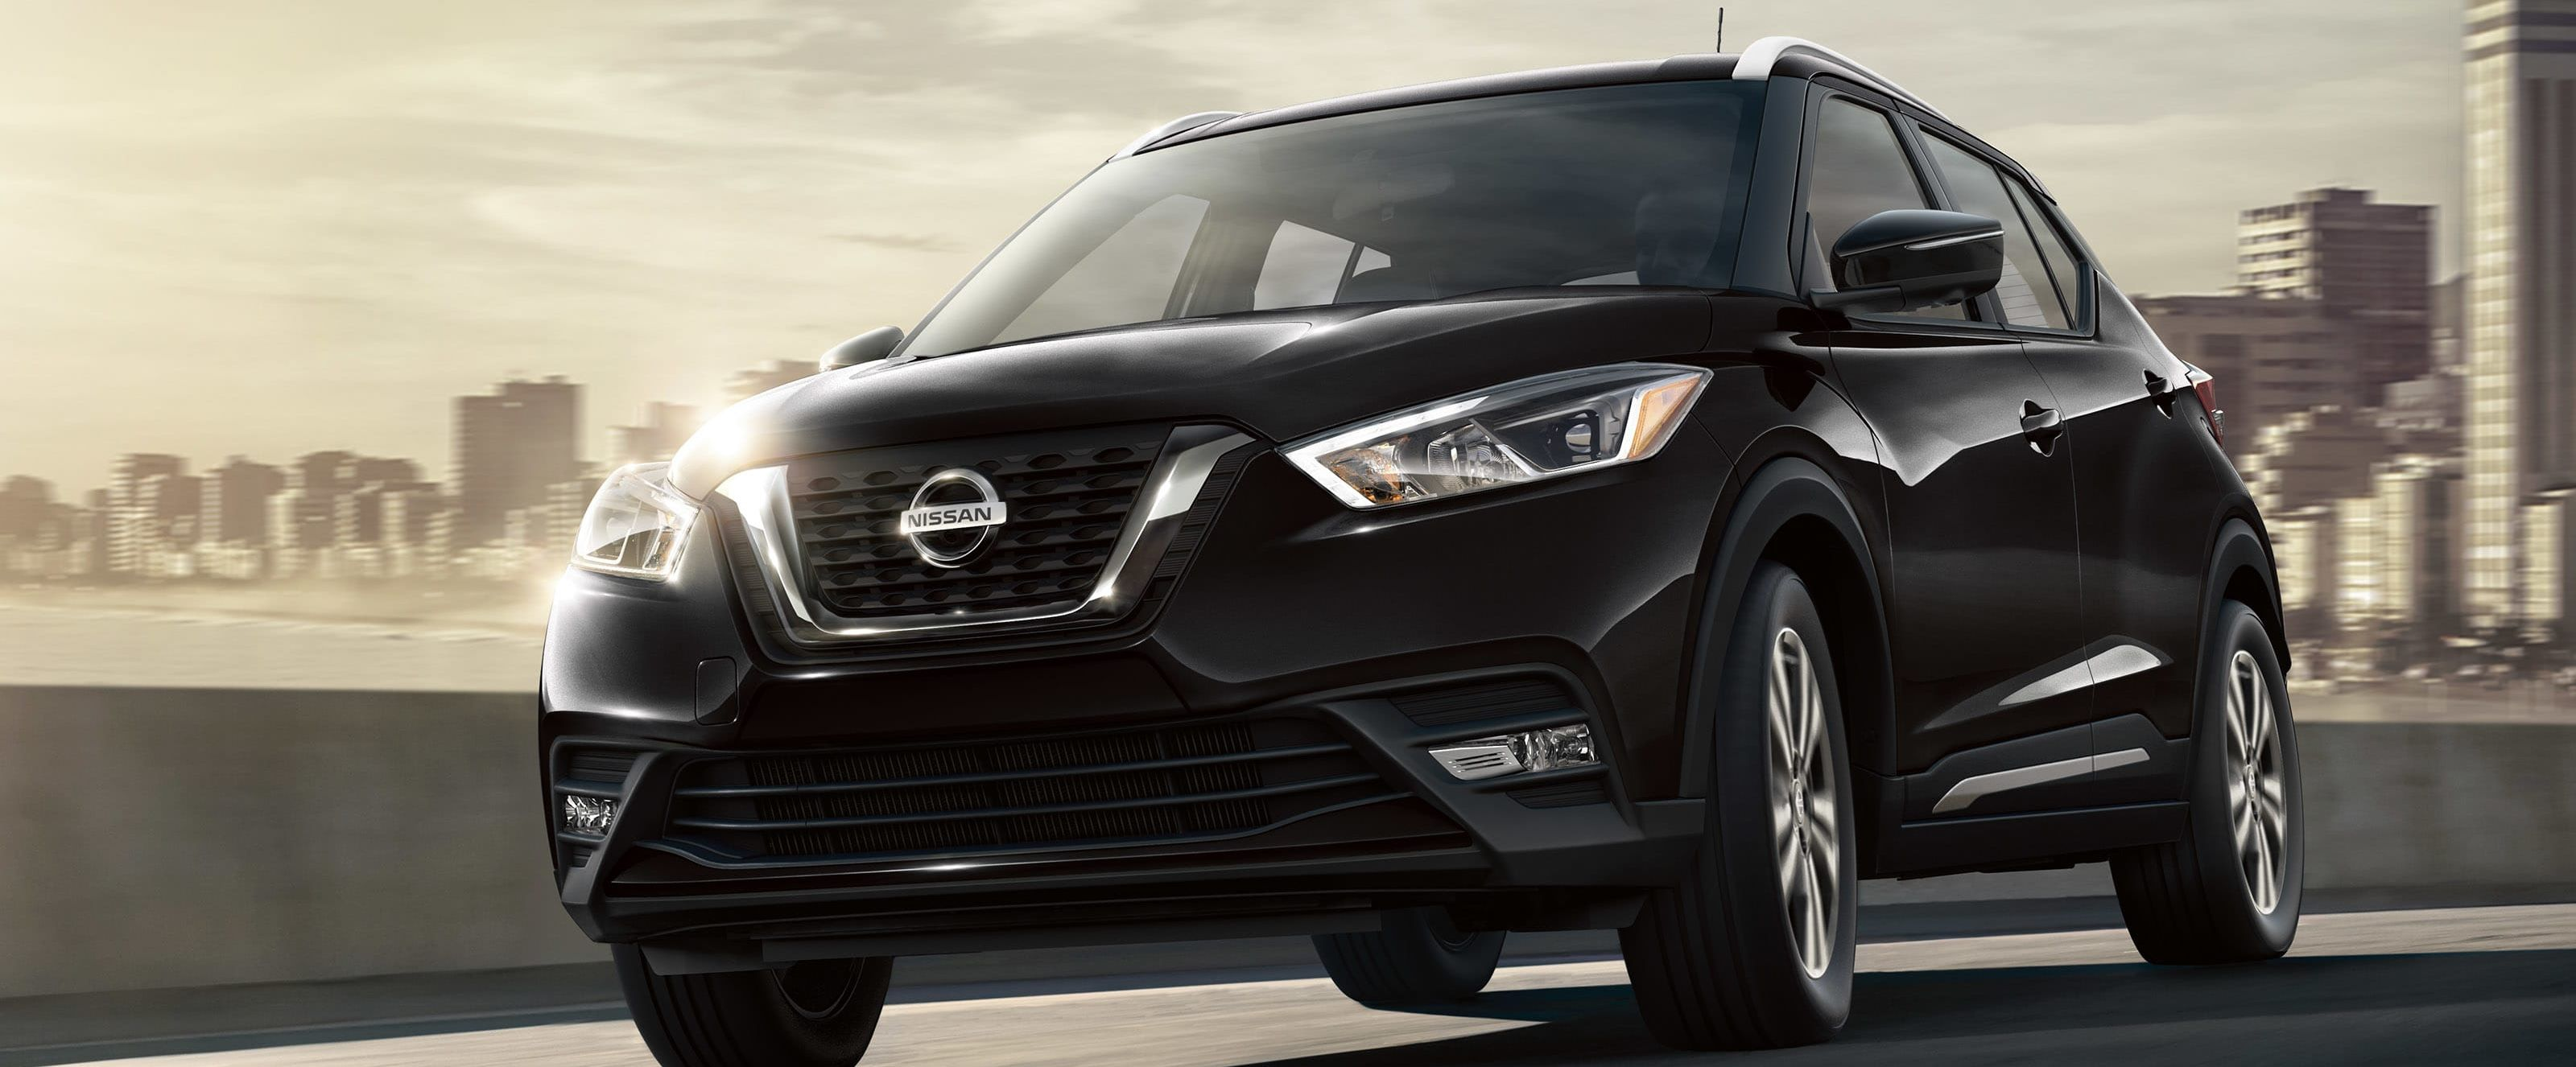 2019 Nissan Kicks Leasing near Richmond, VA